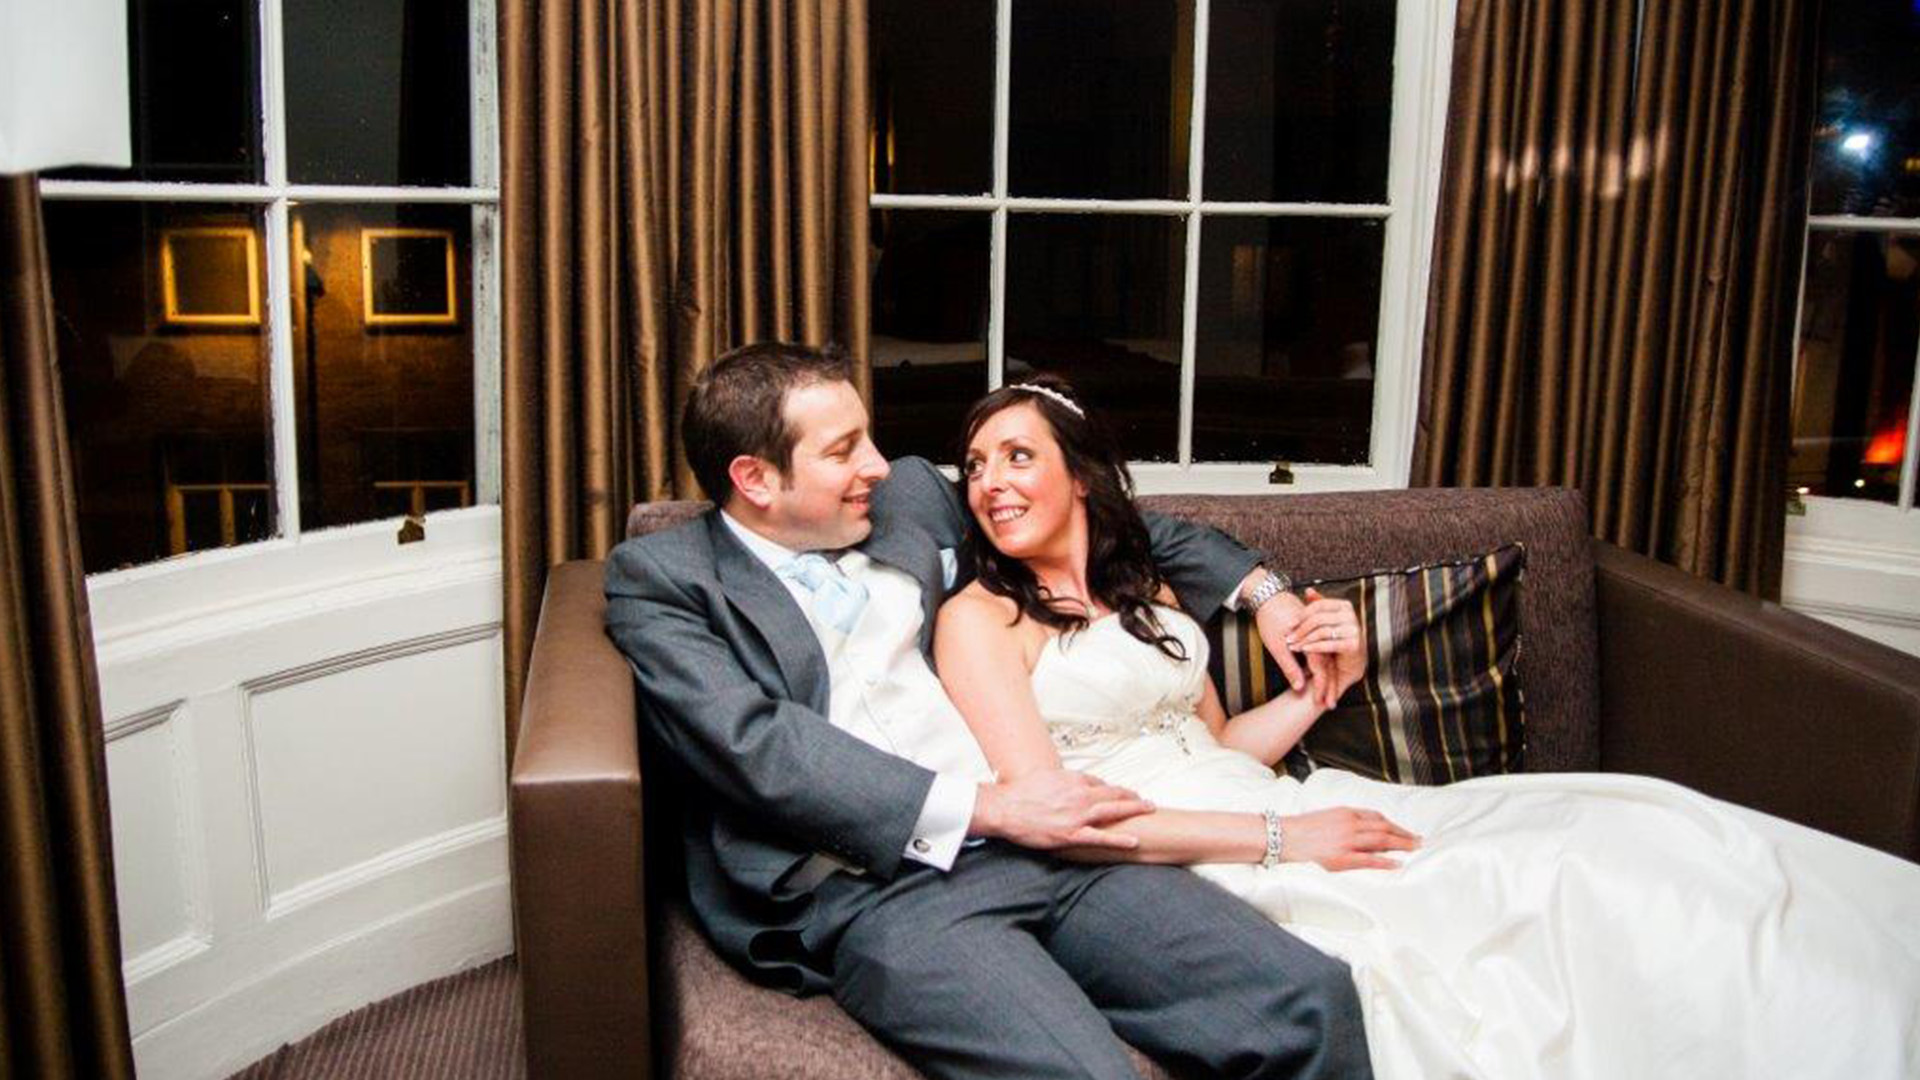 Wedding Venues in Hampshire Mercure Southampton Centre Dolphin Hotel Honeymoon Suite 4